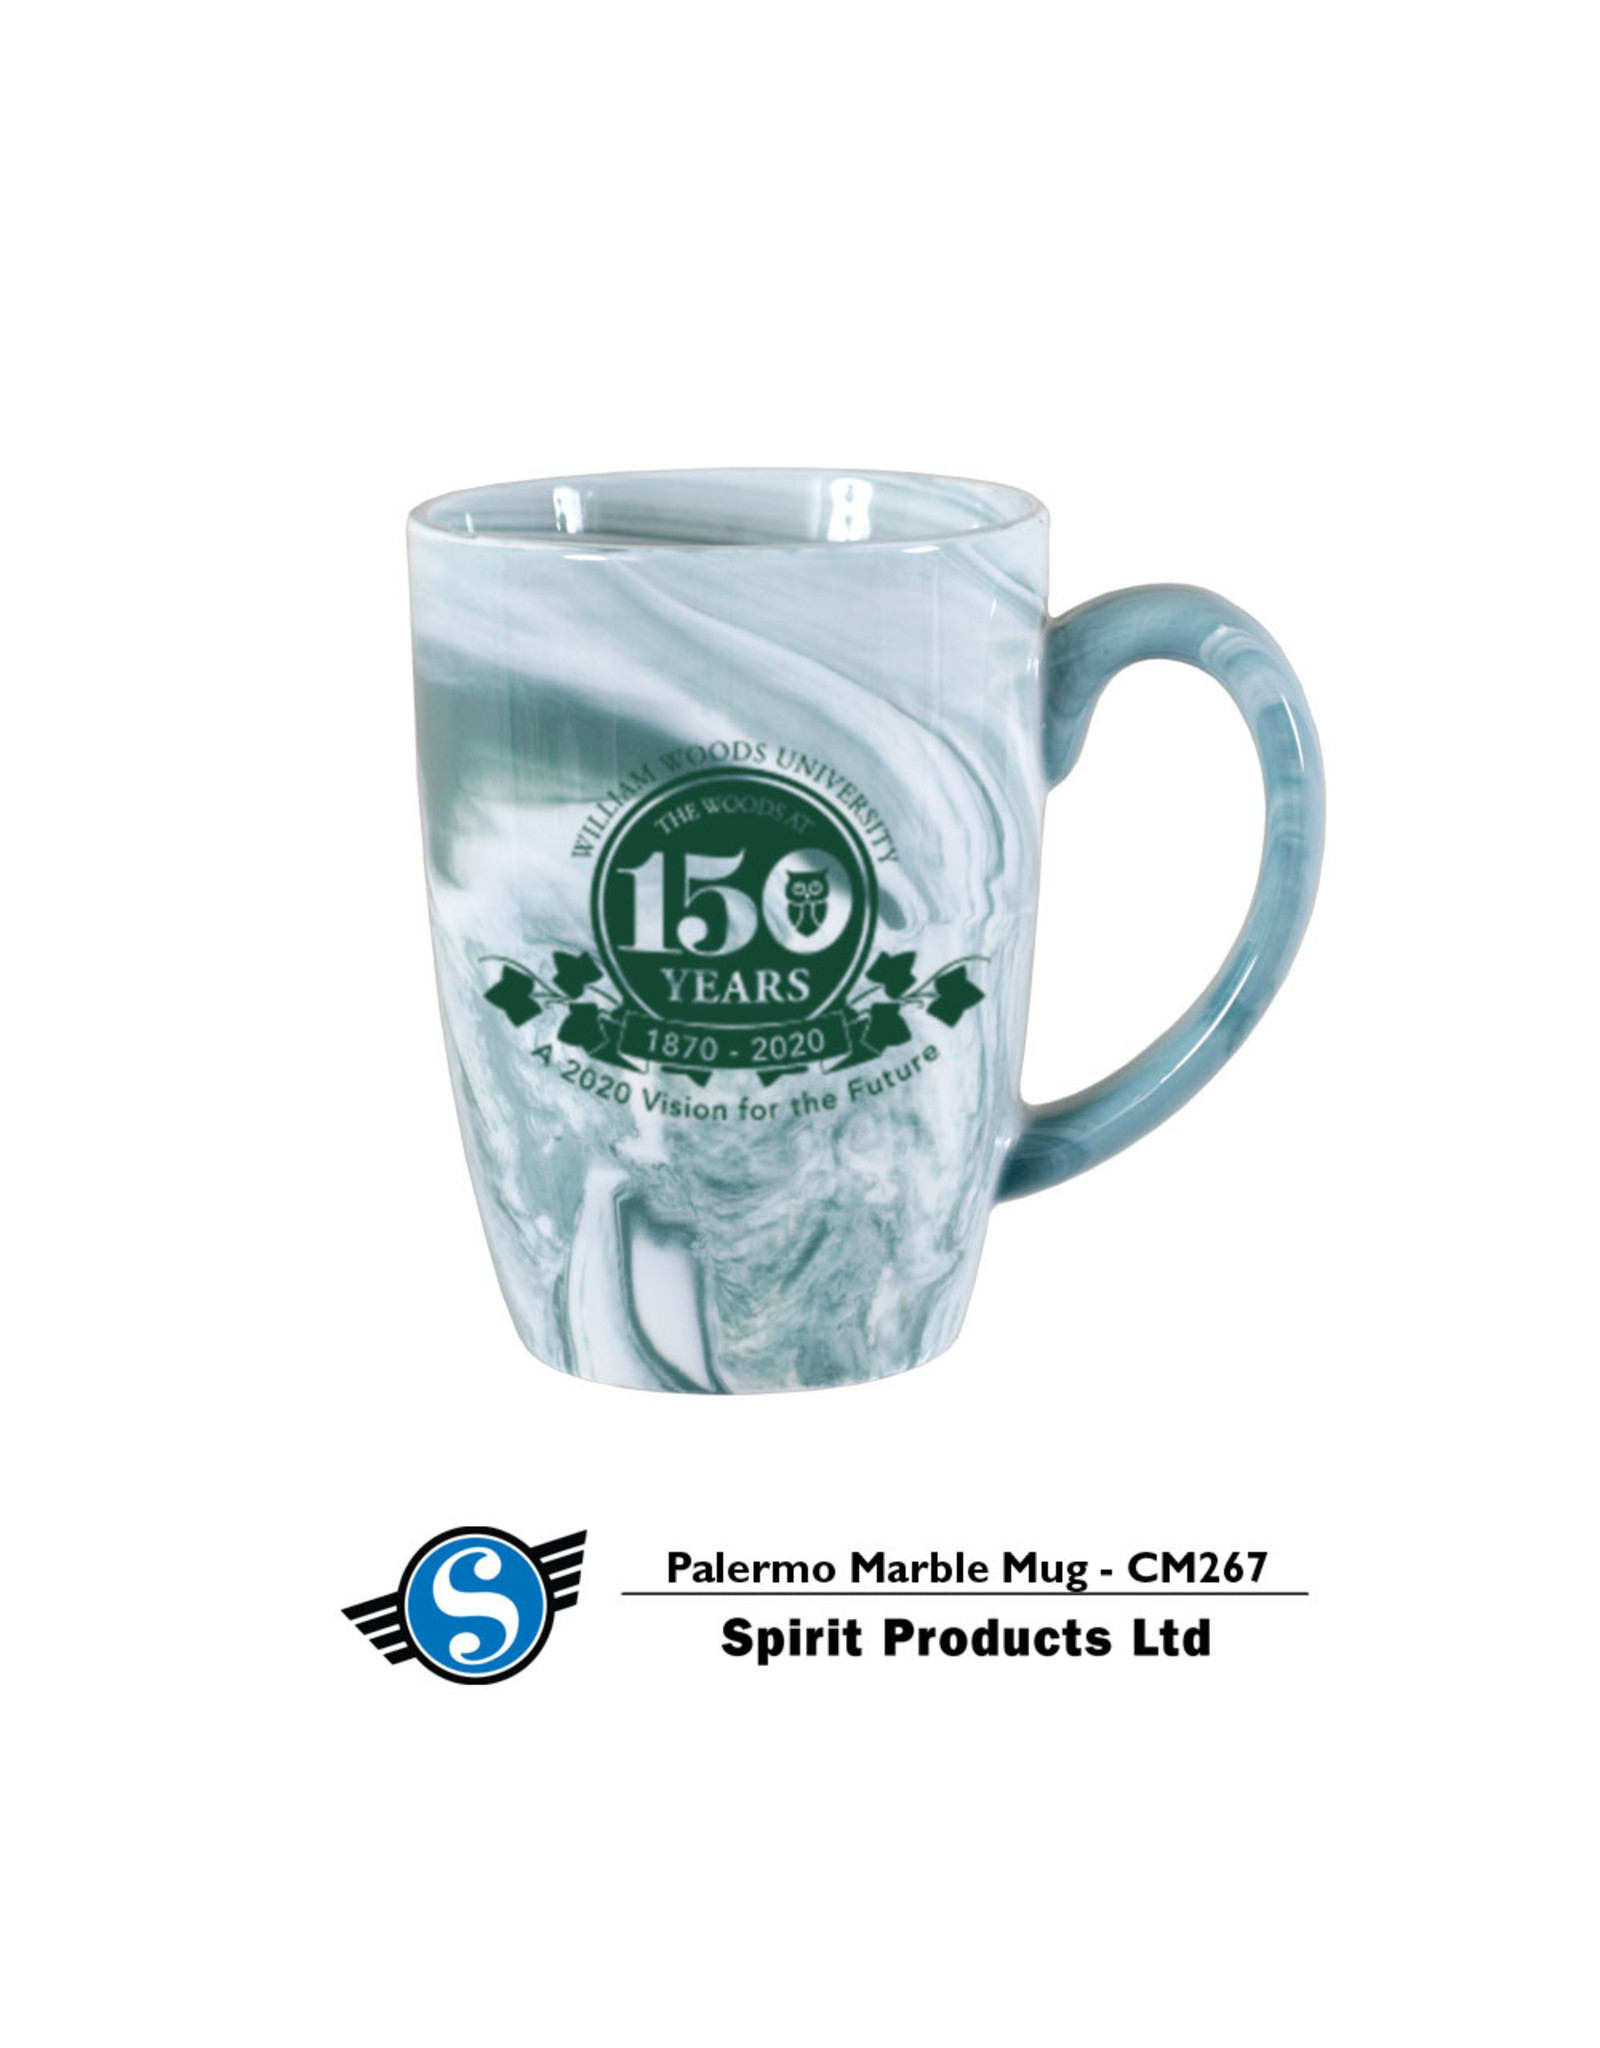 Palermo Marble 150th Mug